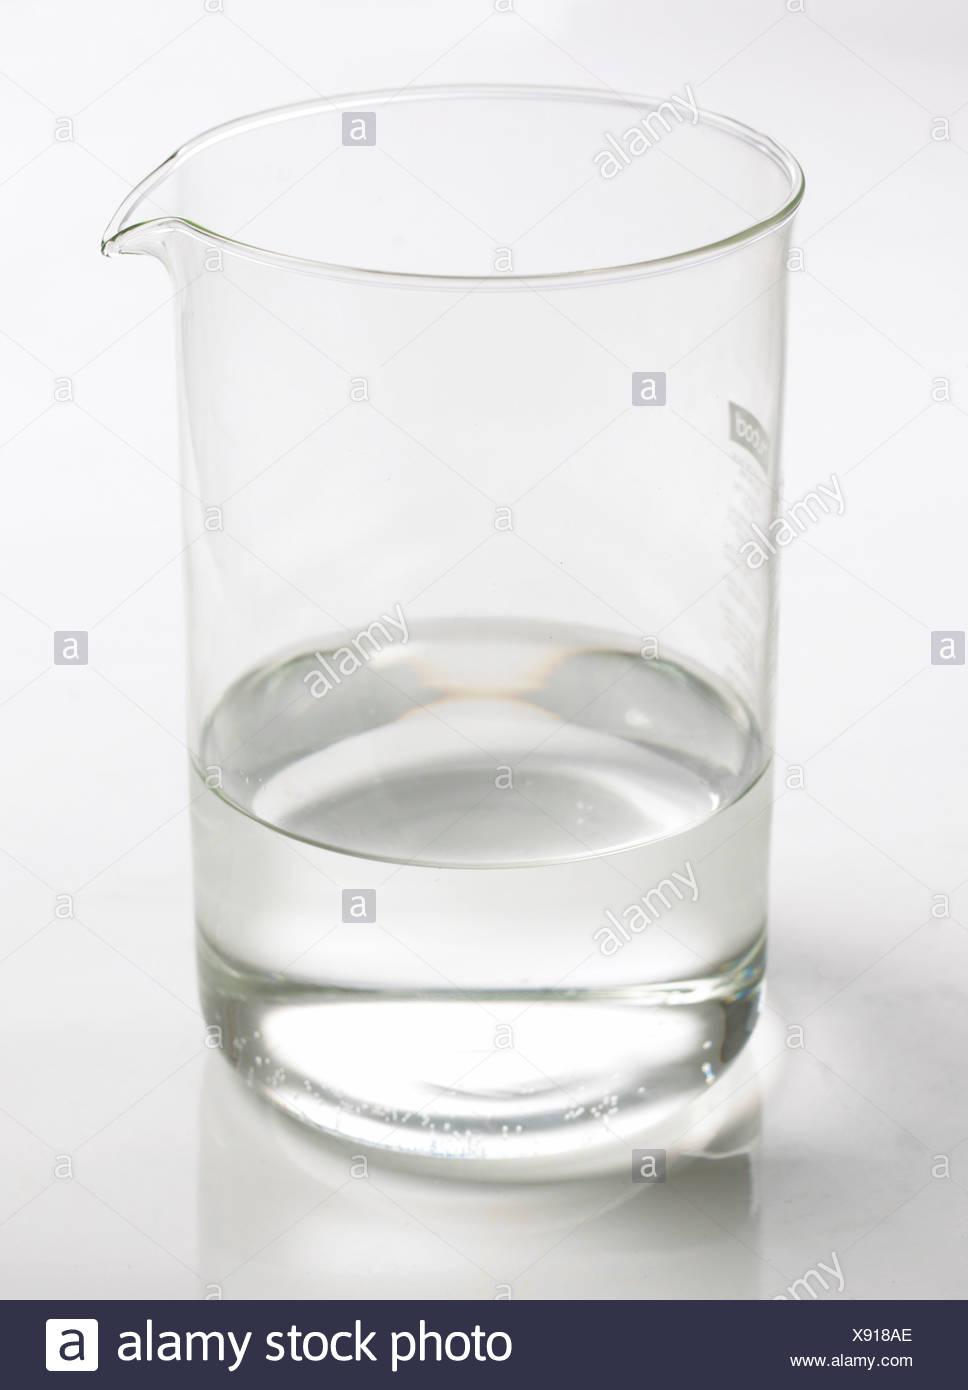 Vaso de agua sobre fondo blanco. Imagen De Stock